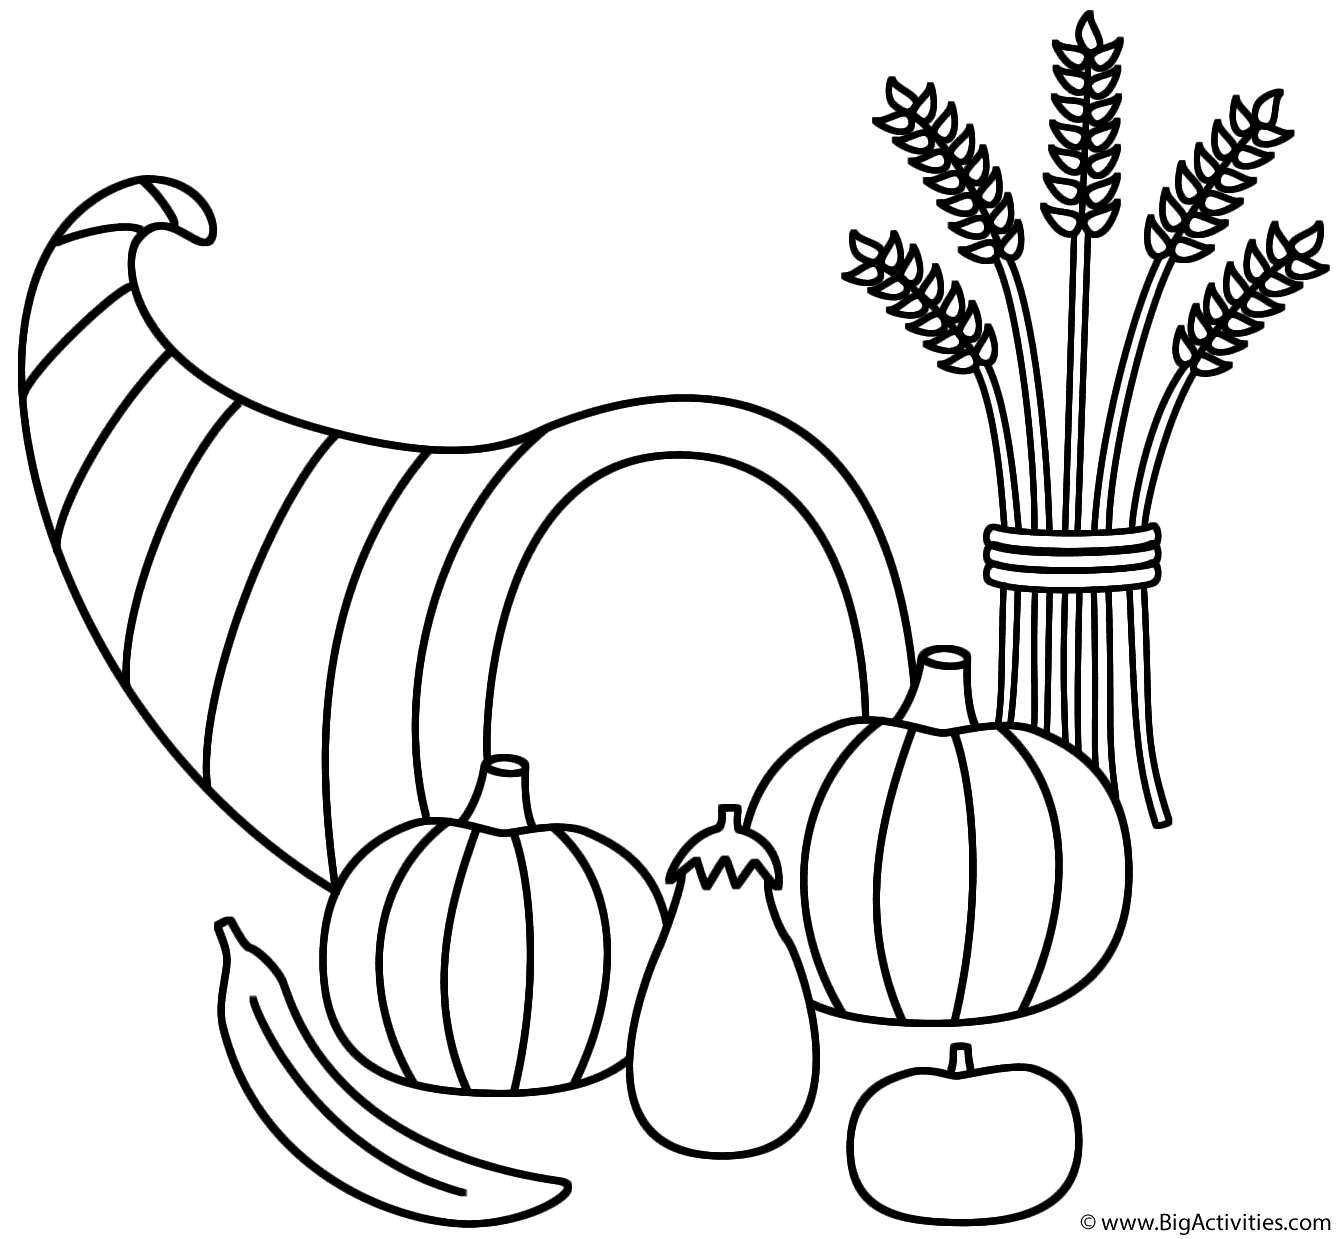 1339x1239 Horn Of Plenty With Wheat Sheaf